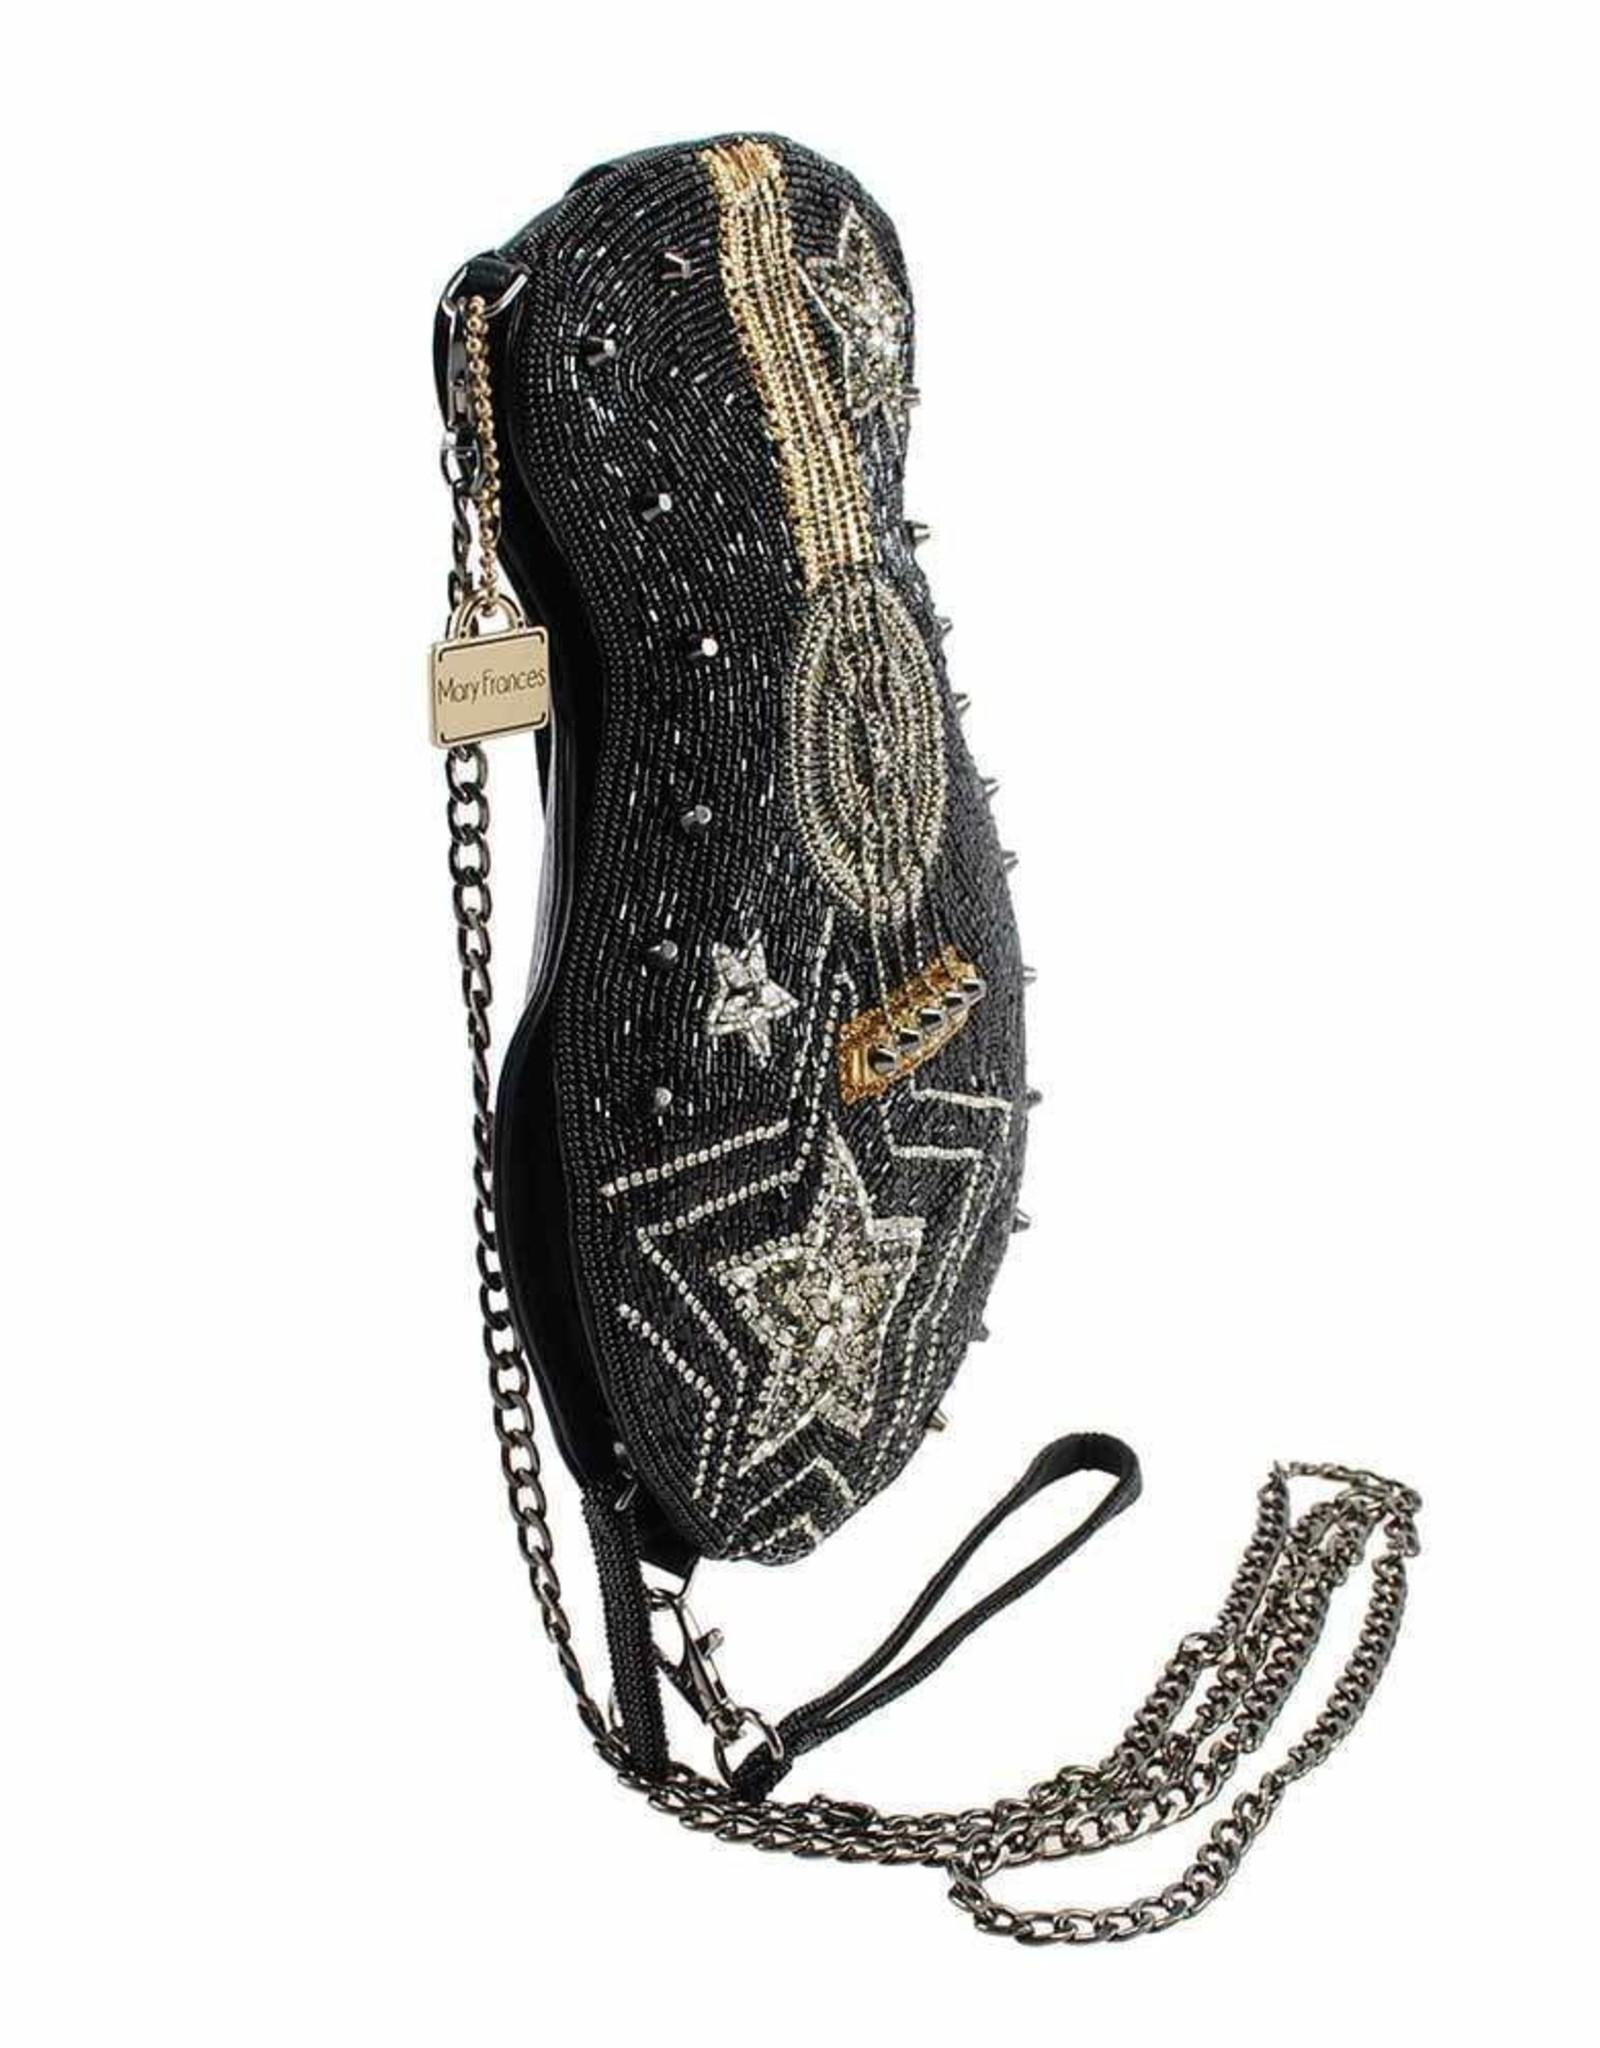 Mary Frances Mary Frances Handbag SUPERSTAR GUITAR